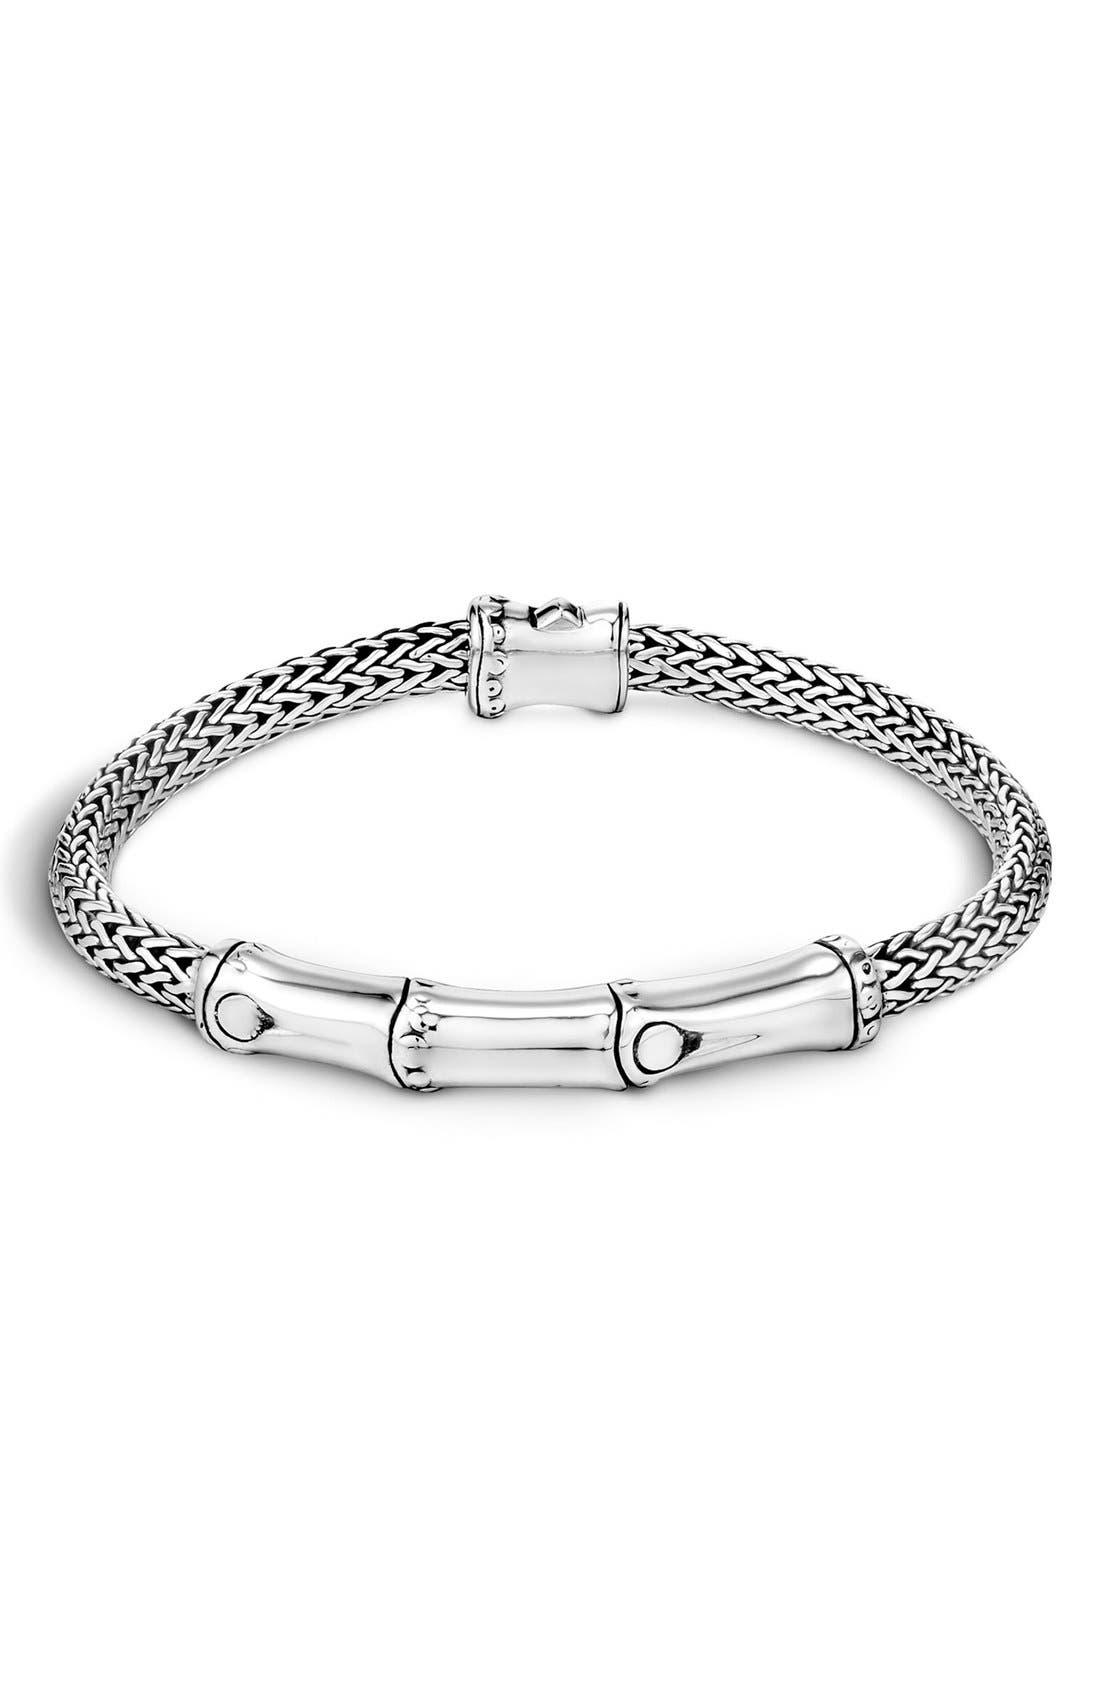 Bamboo 4mm Bracelet,                         Main,                         color, Sterling Silver